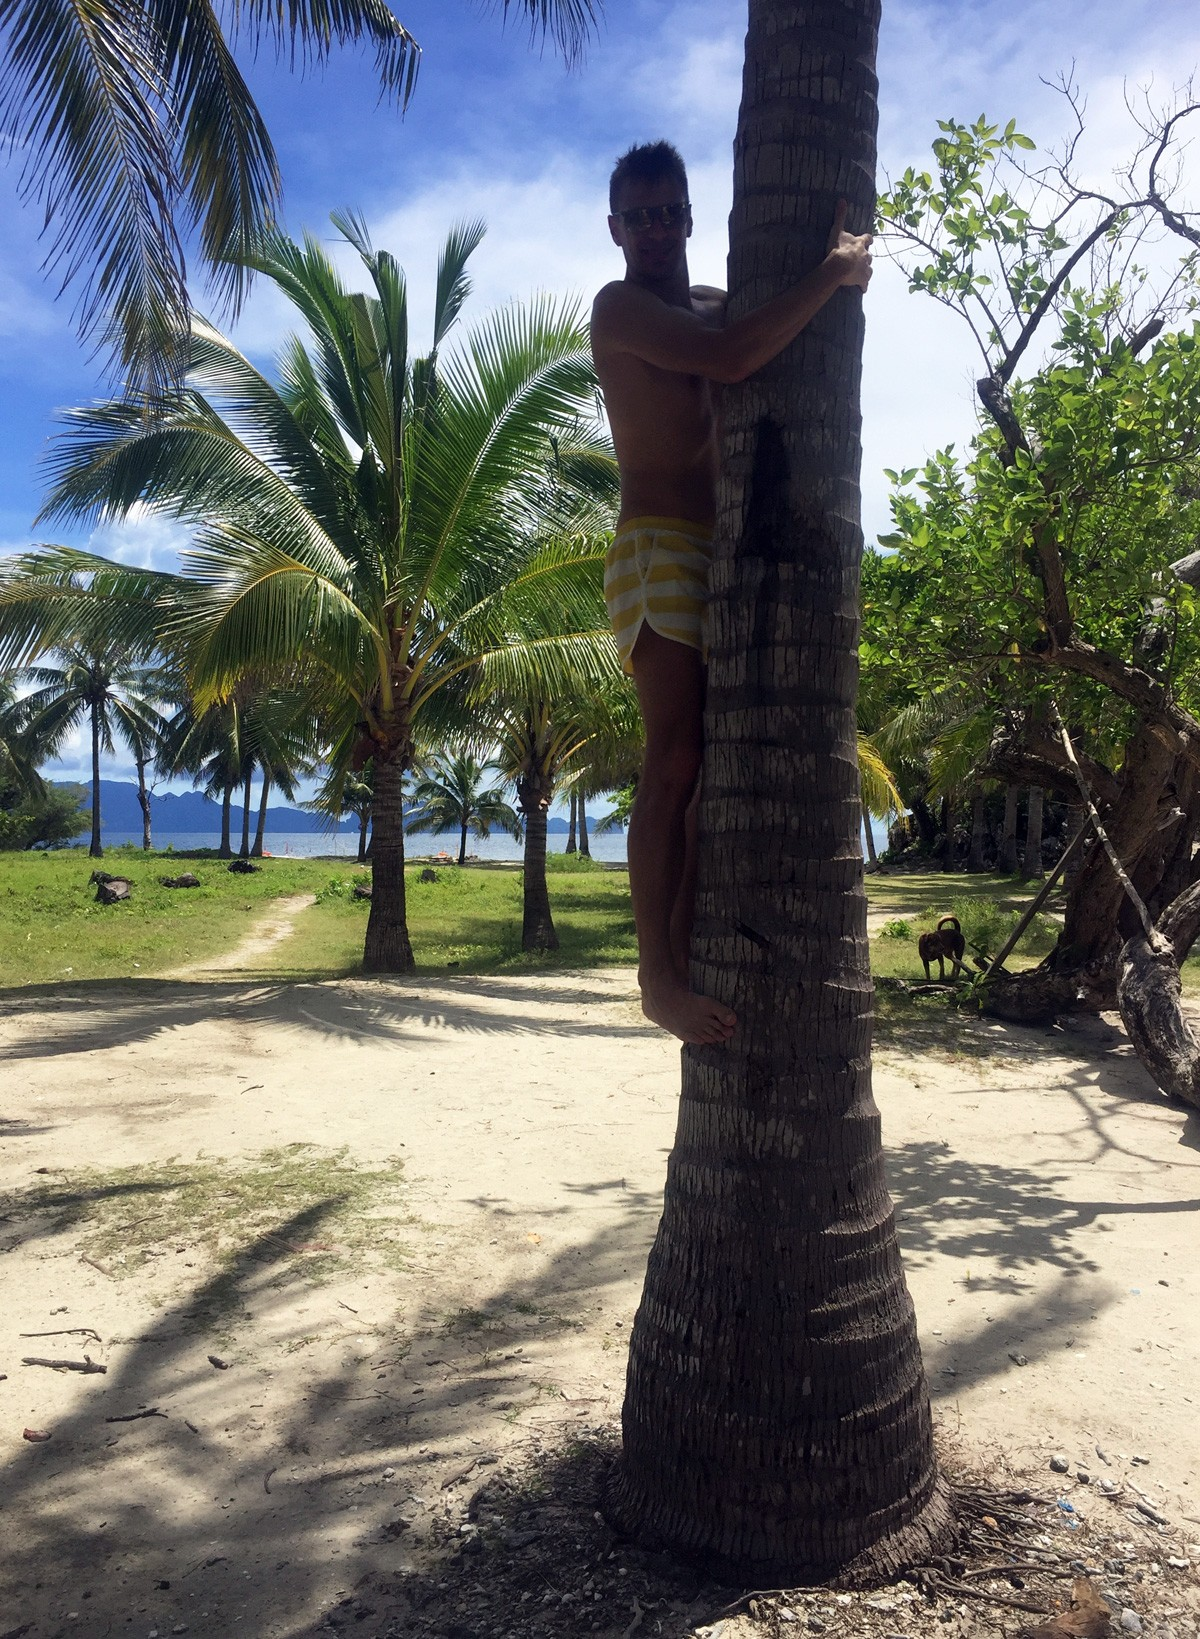 Andrei on Palm tree in Malcapuya island - Travelblogstories